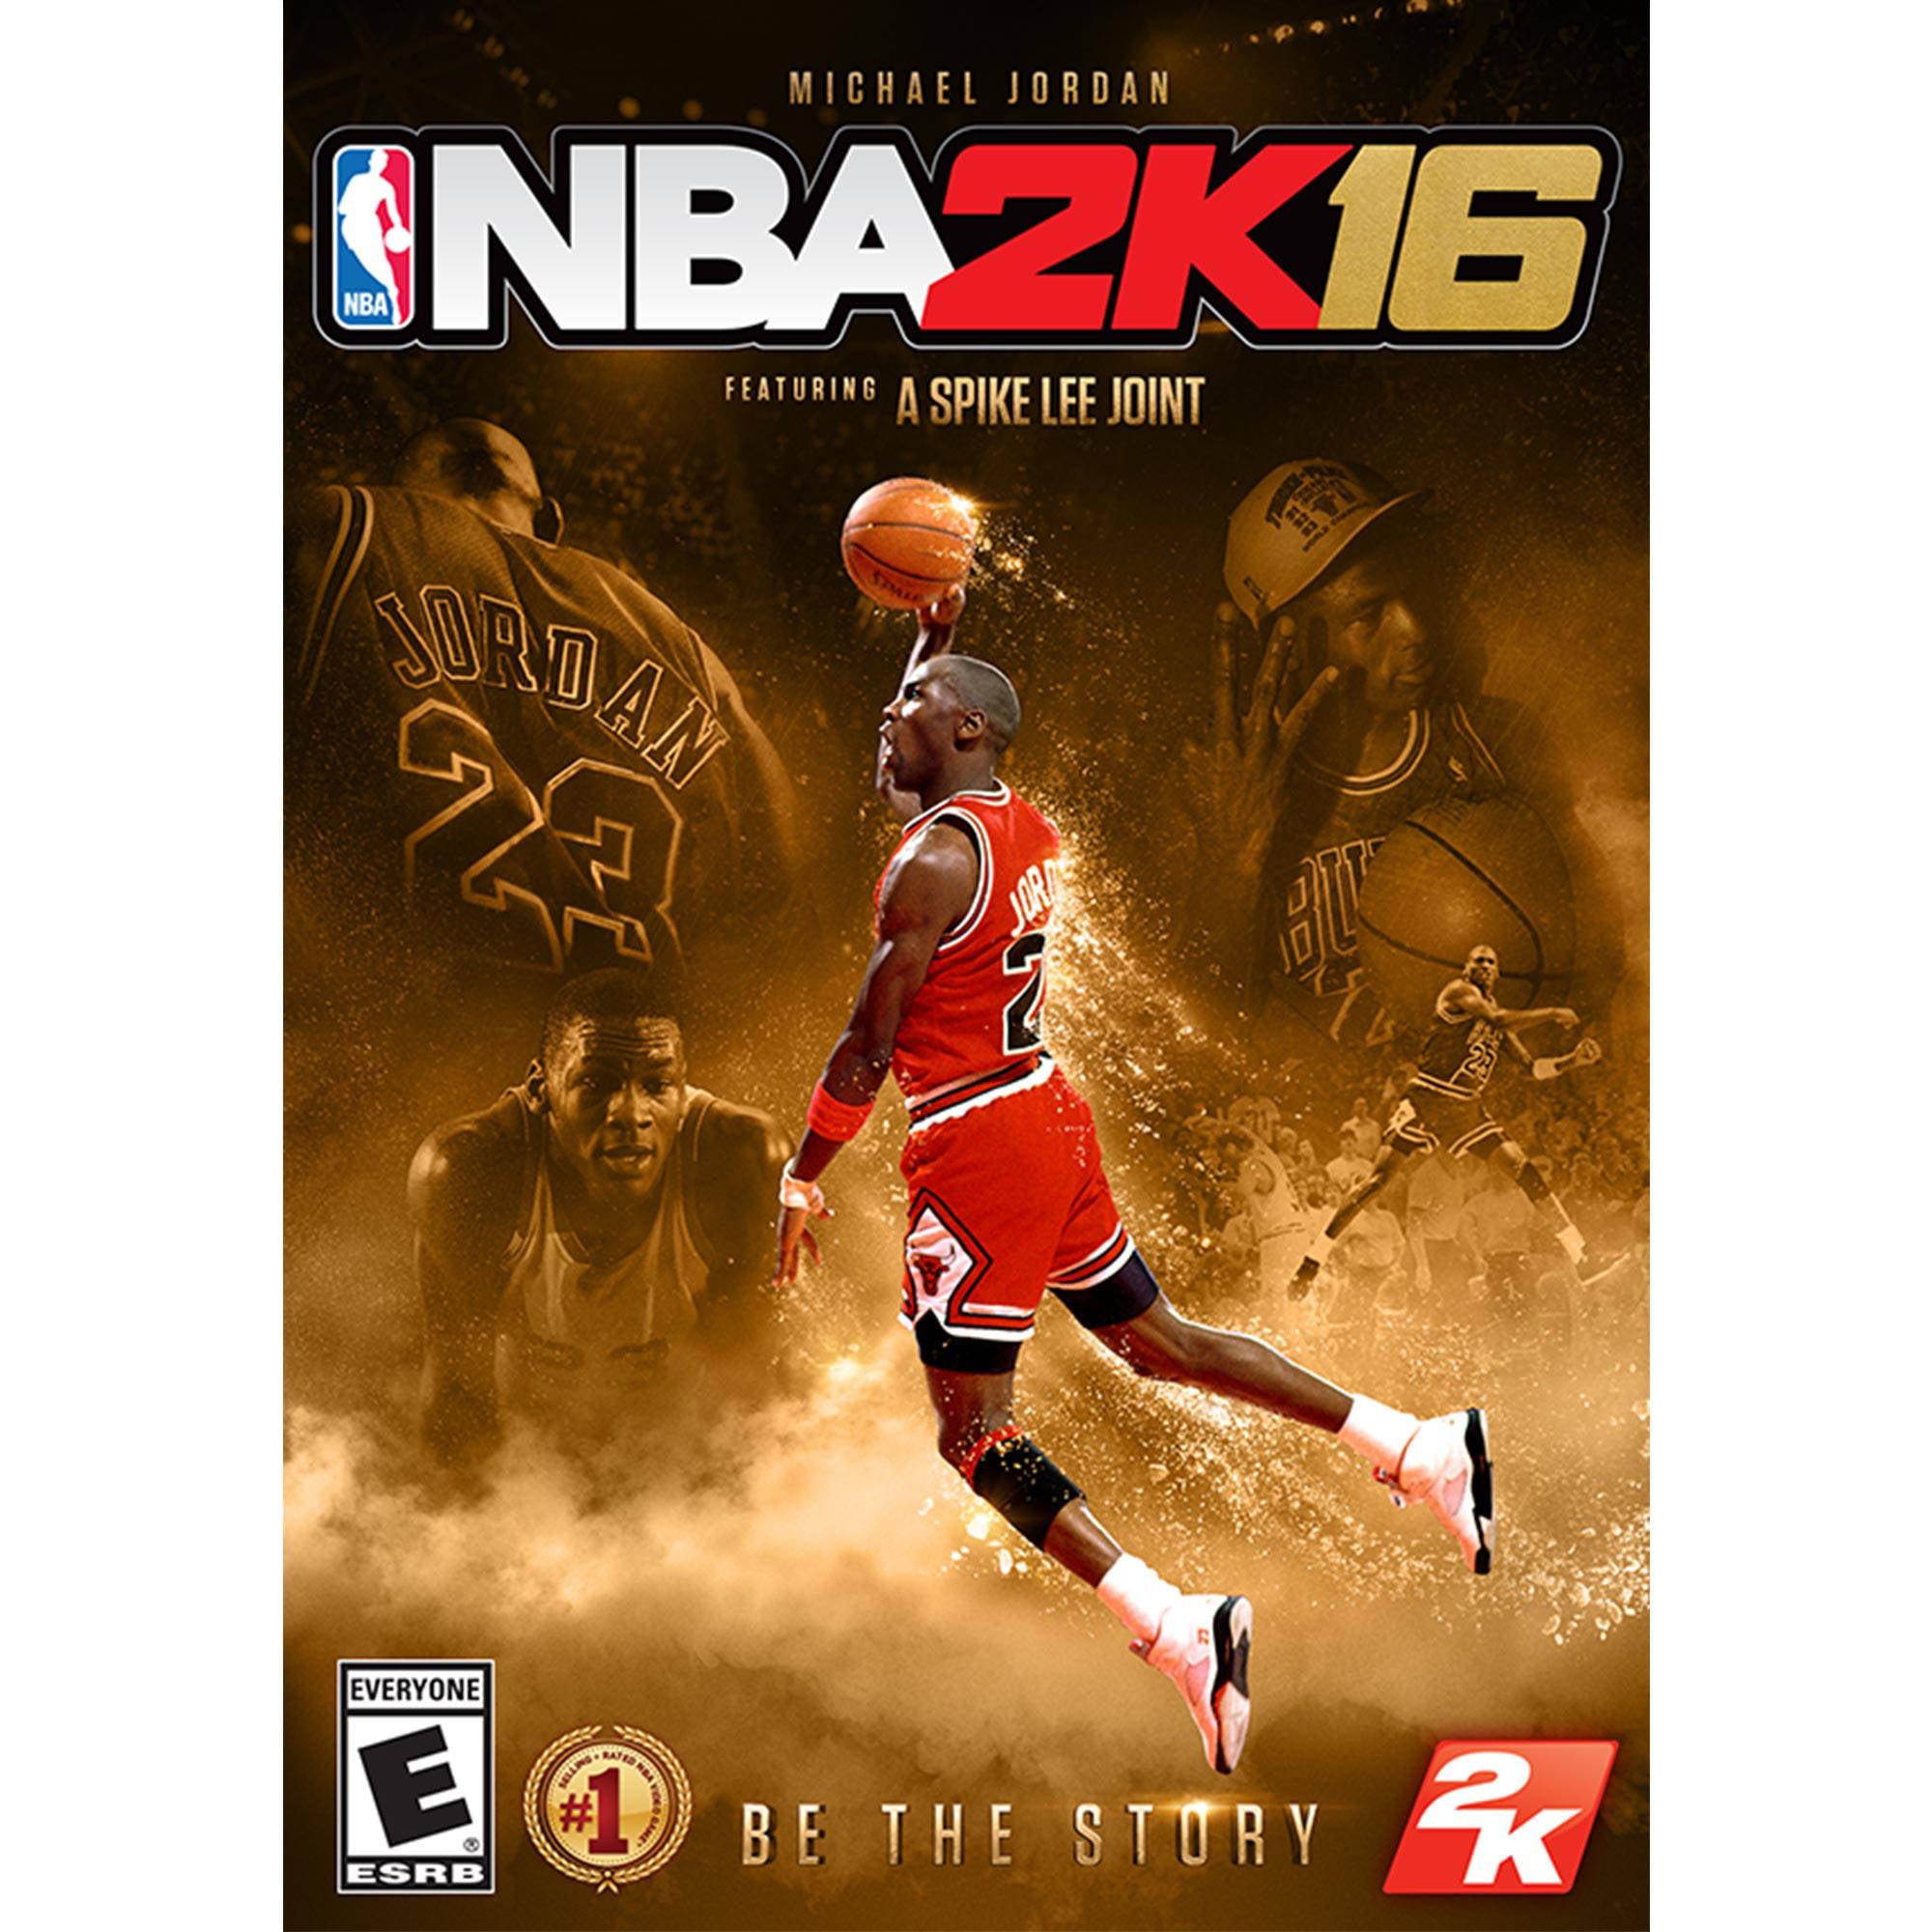 NBA 2K16 Michael Jordan Special Edition (PC) (Digital Download)